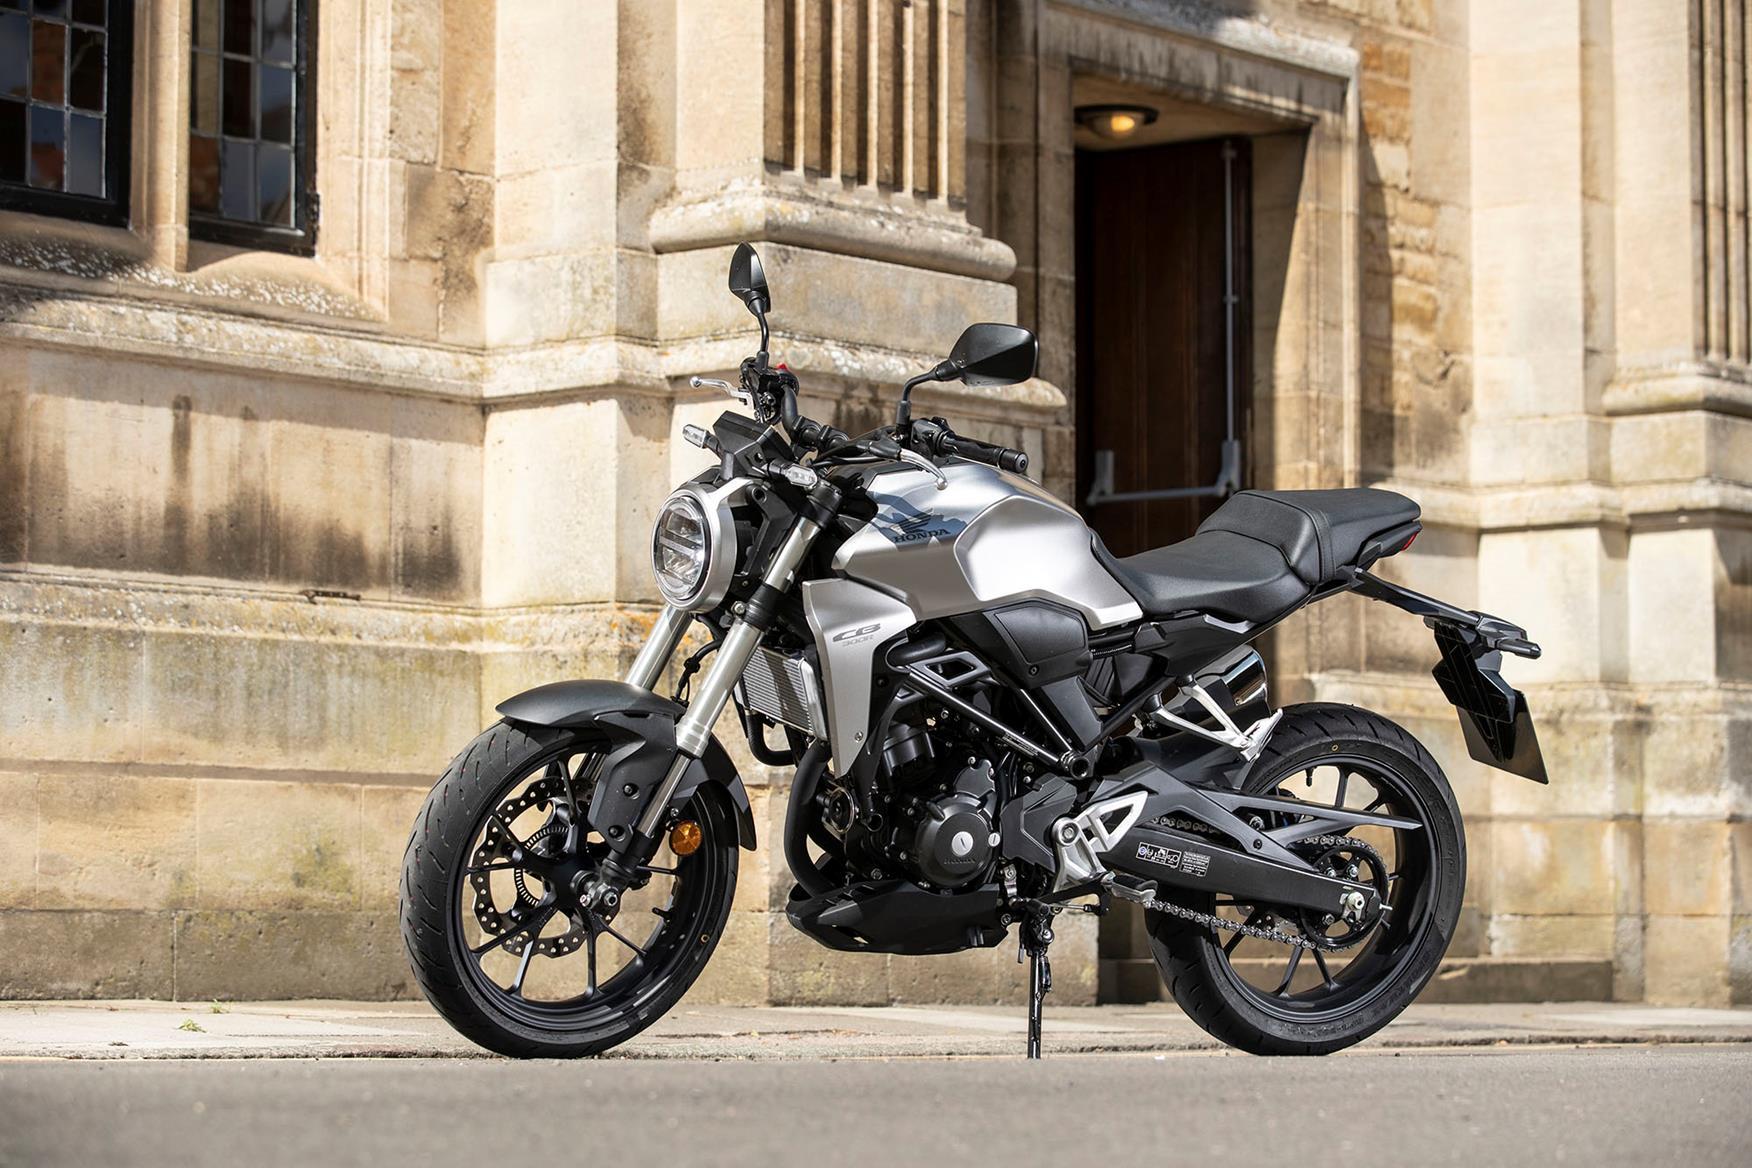 2020 Honda Rebel Top Speed.Honda Cb300r 2018 On Review Speed Specs Prices Mcn